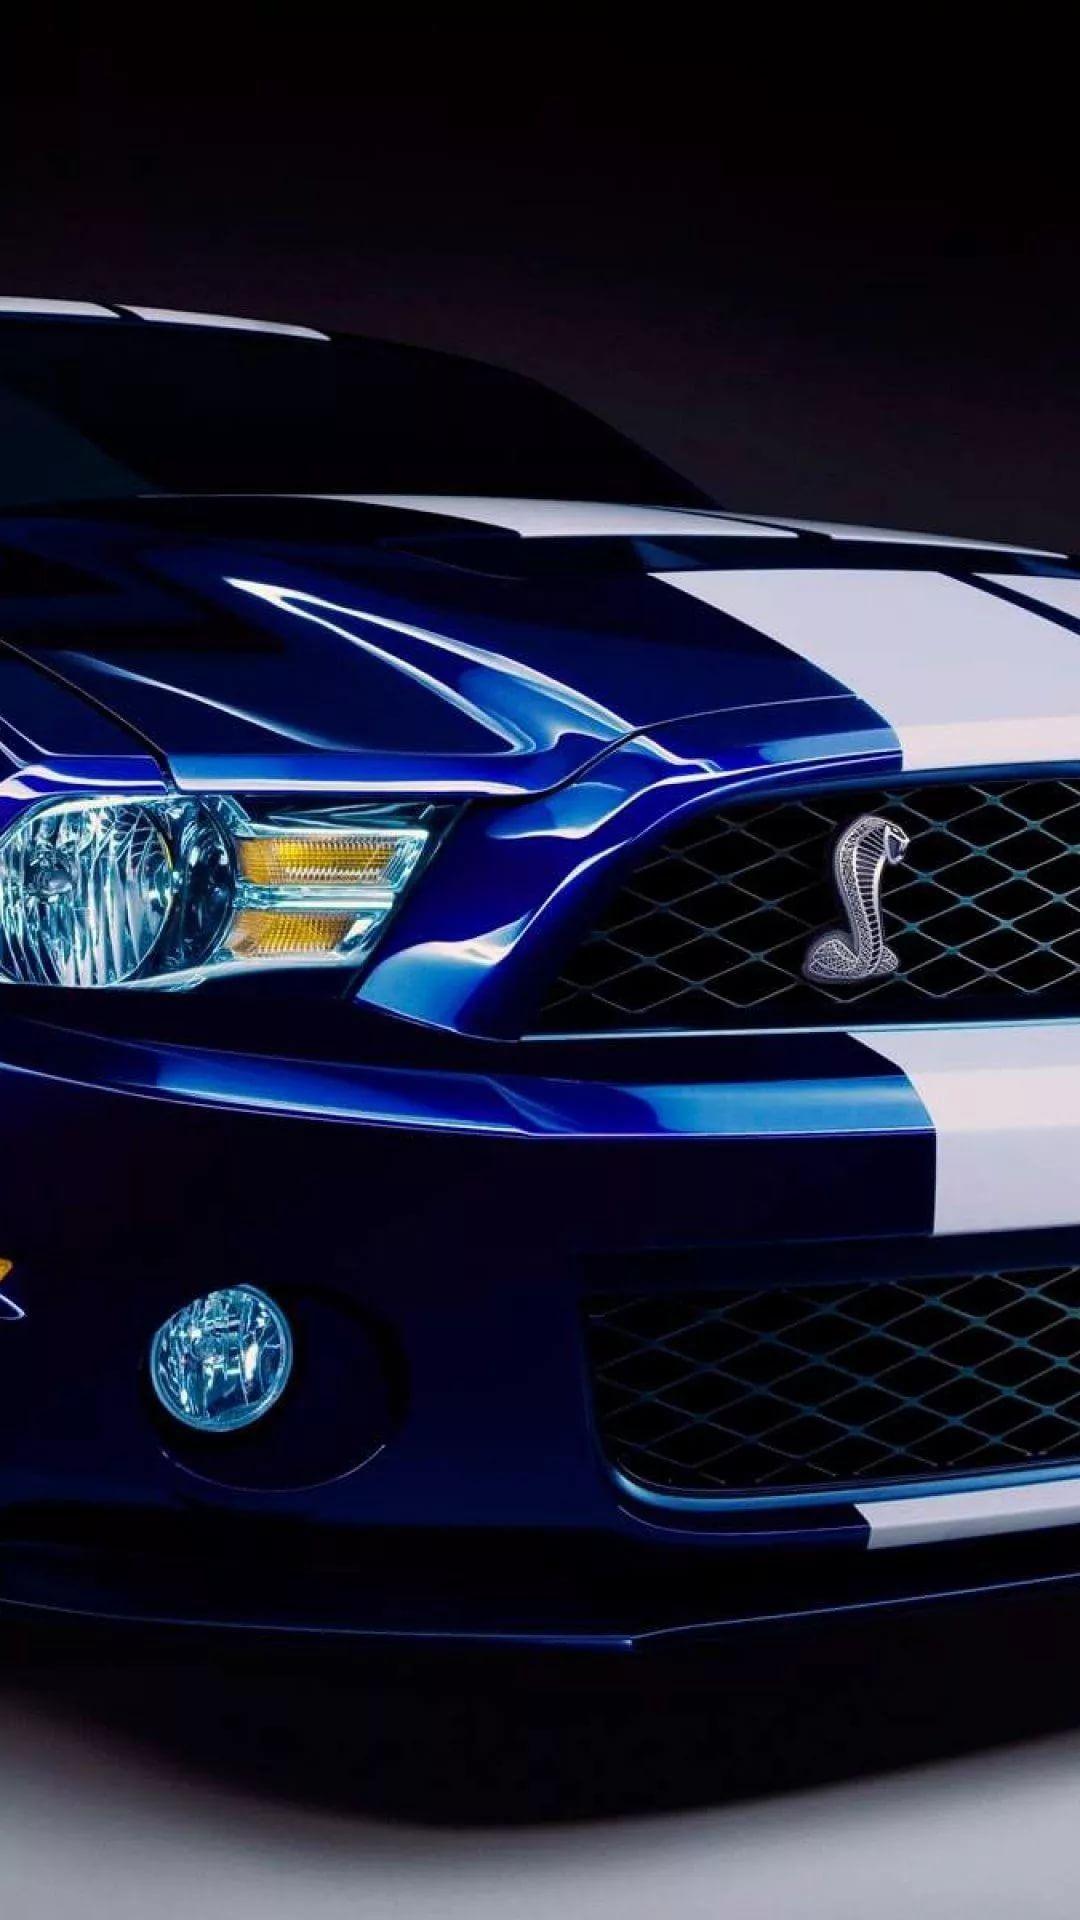 Mustang GT iPhone hd wallpaper